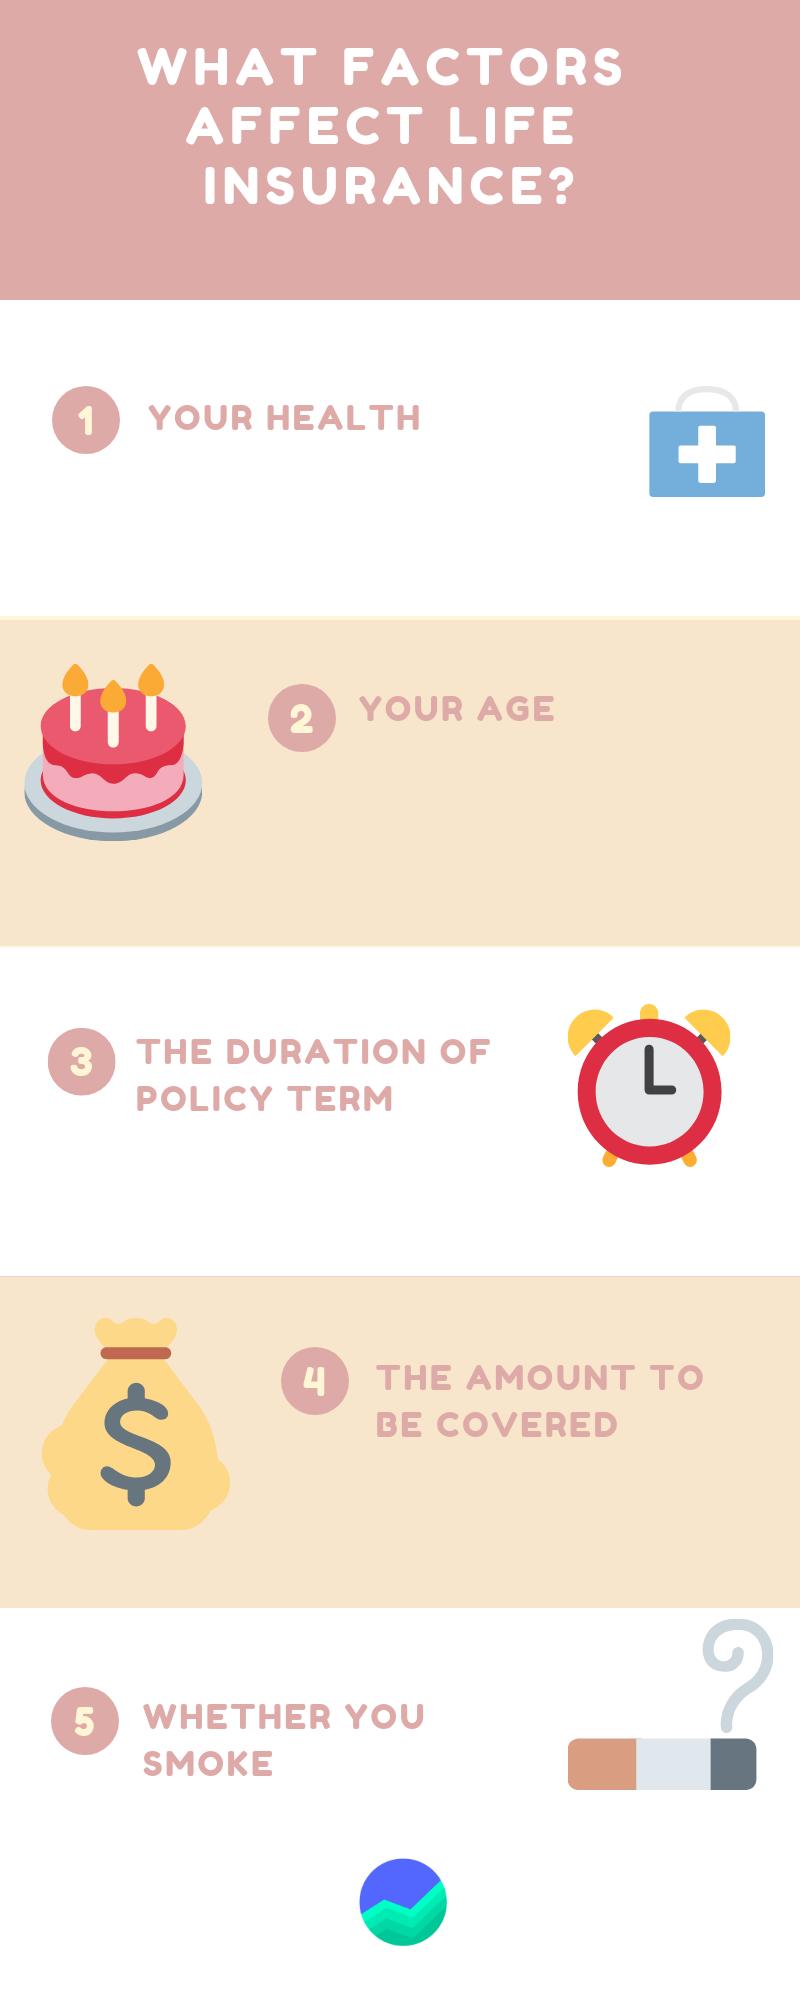 What factors affect life insurance